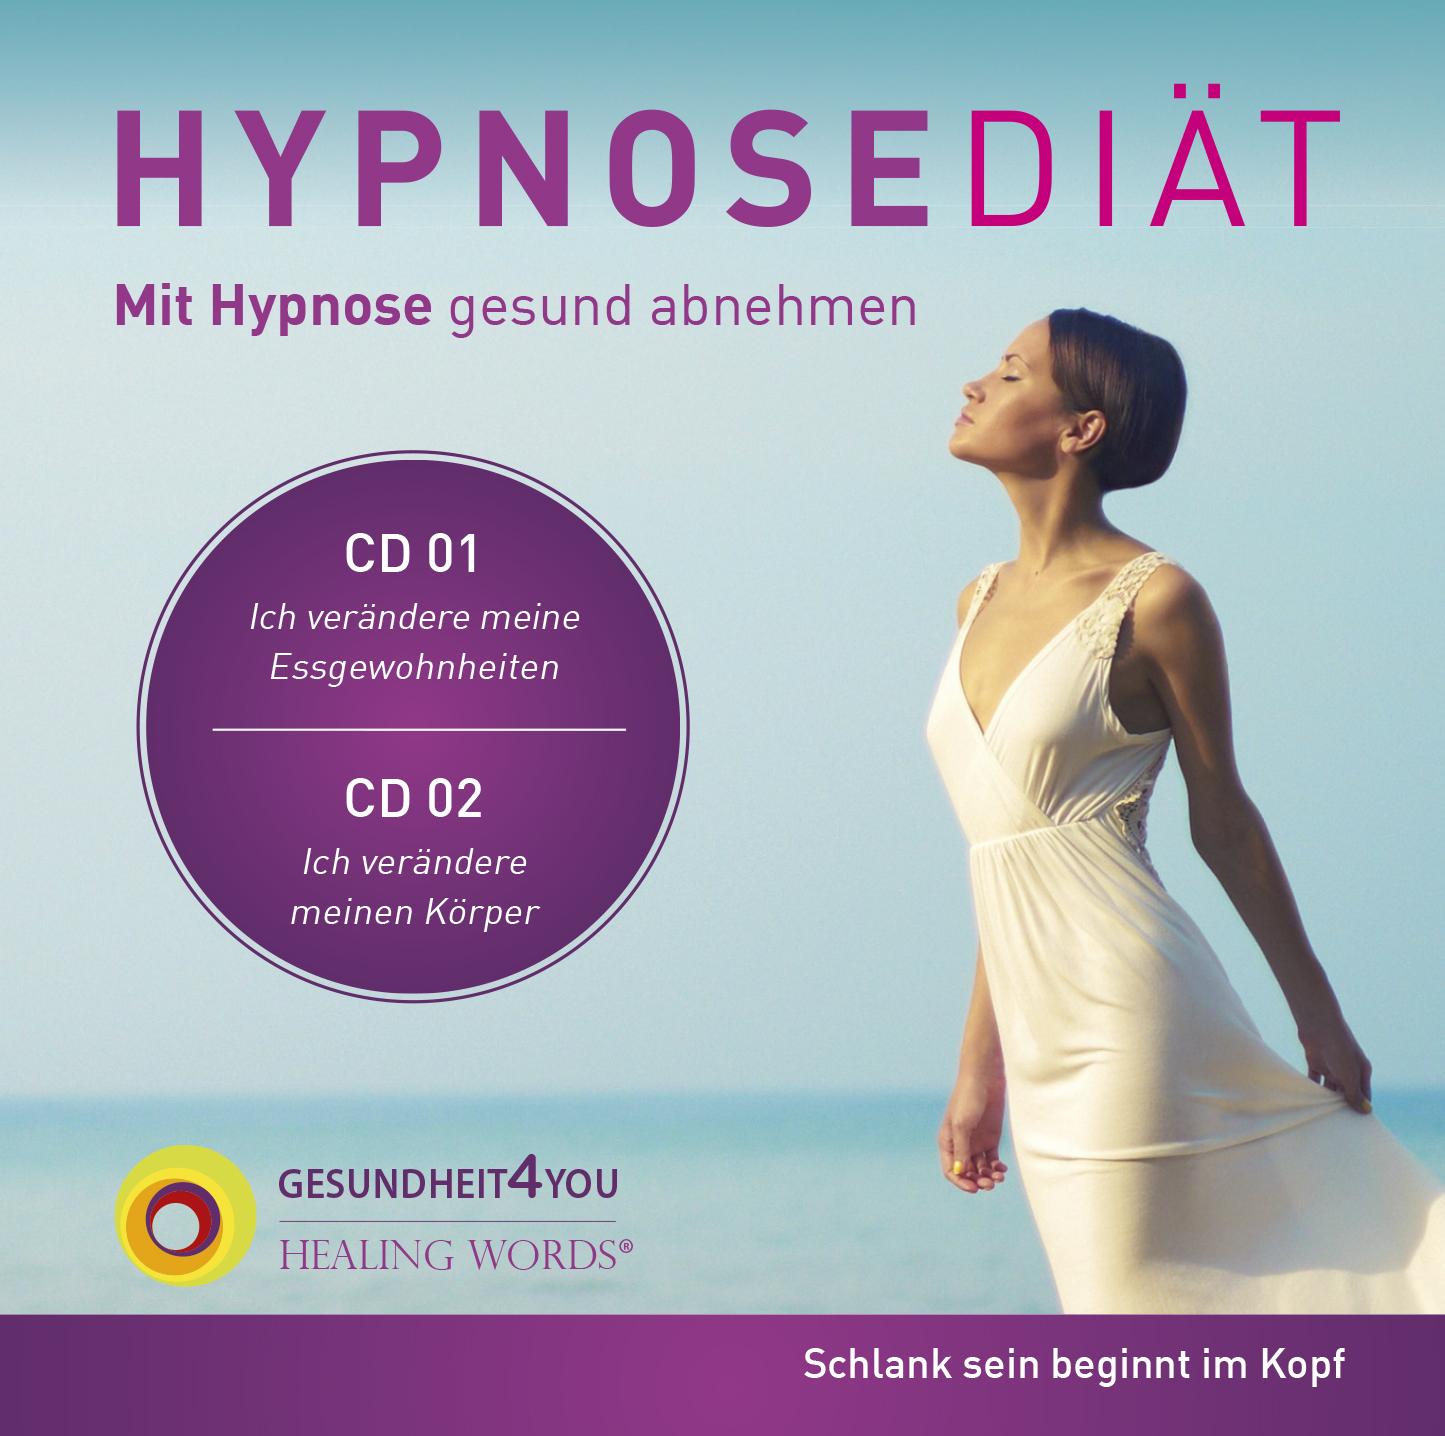 Booklet_Schweifer_Hypnosediaet.indd